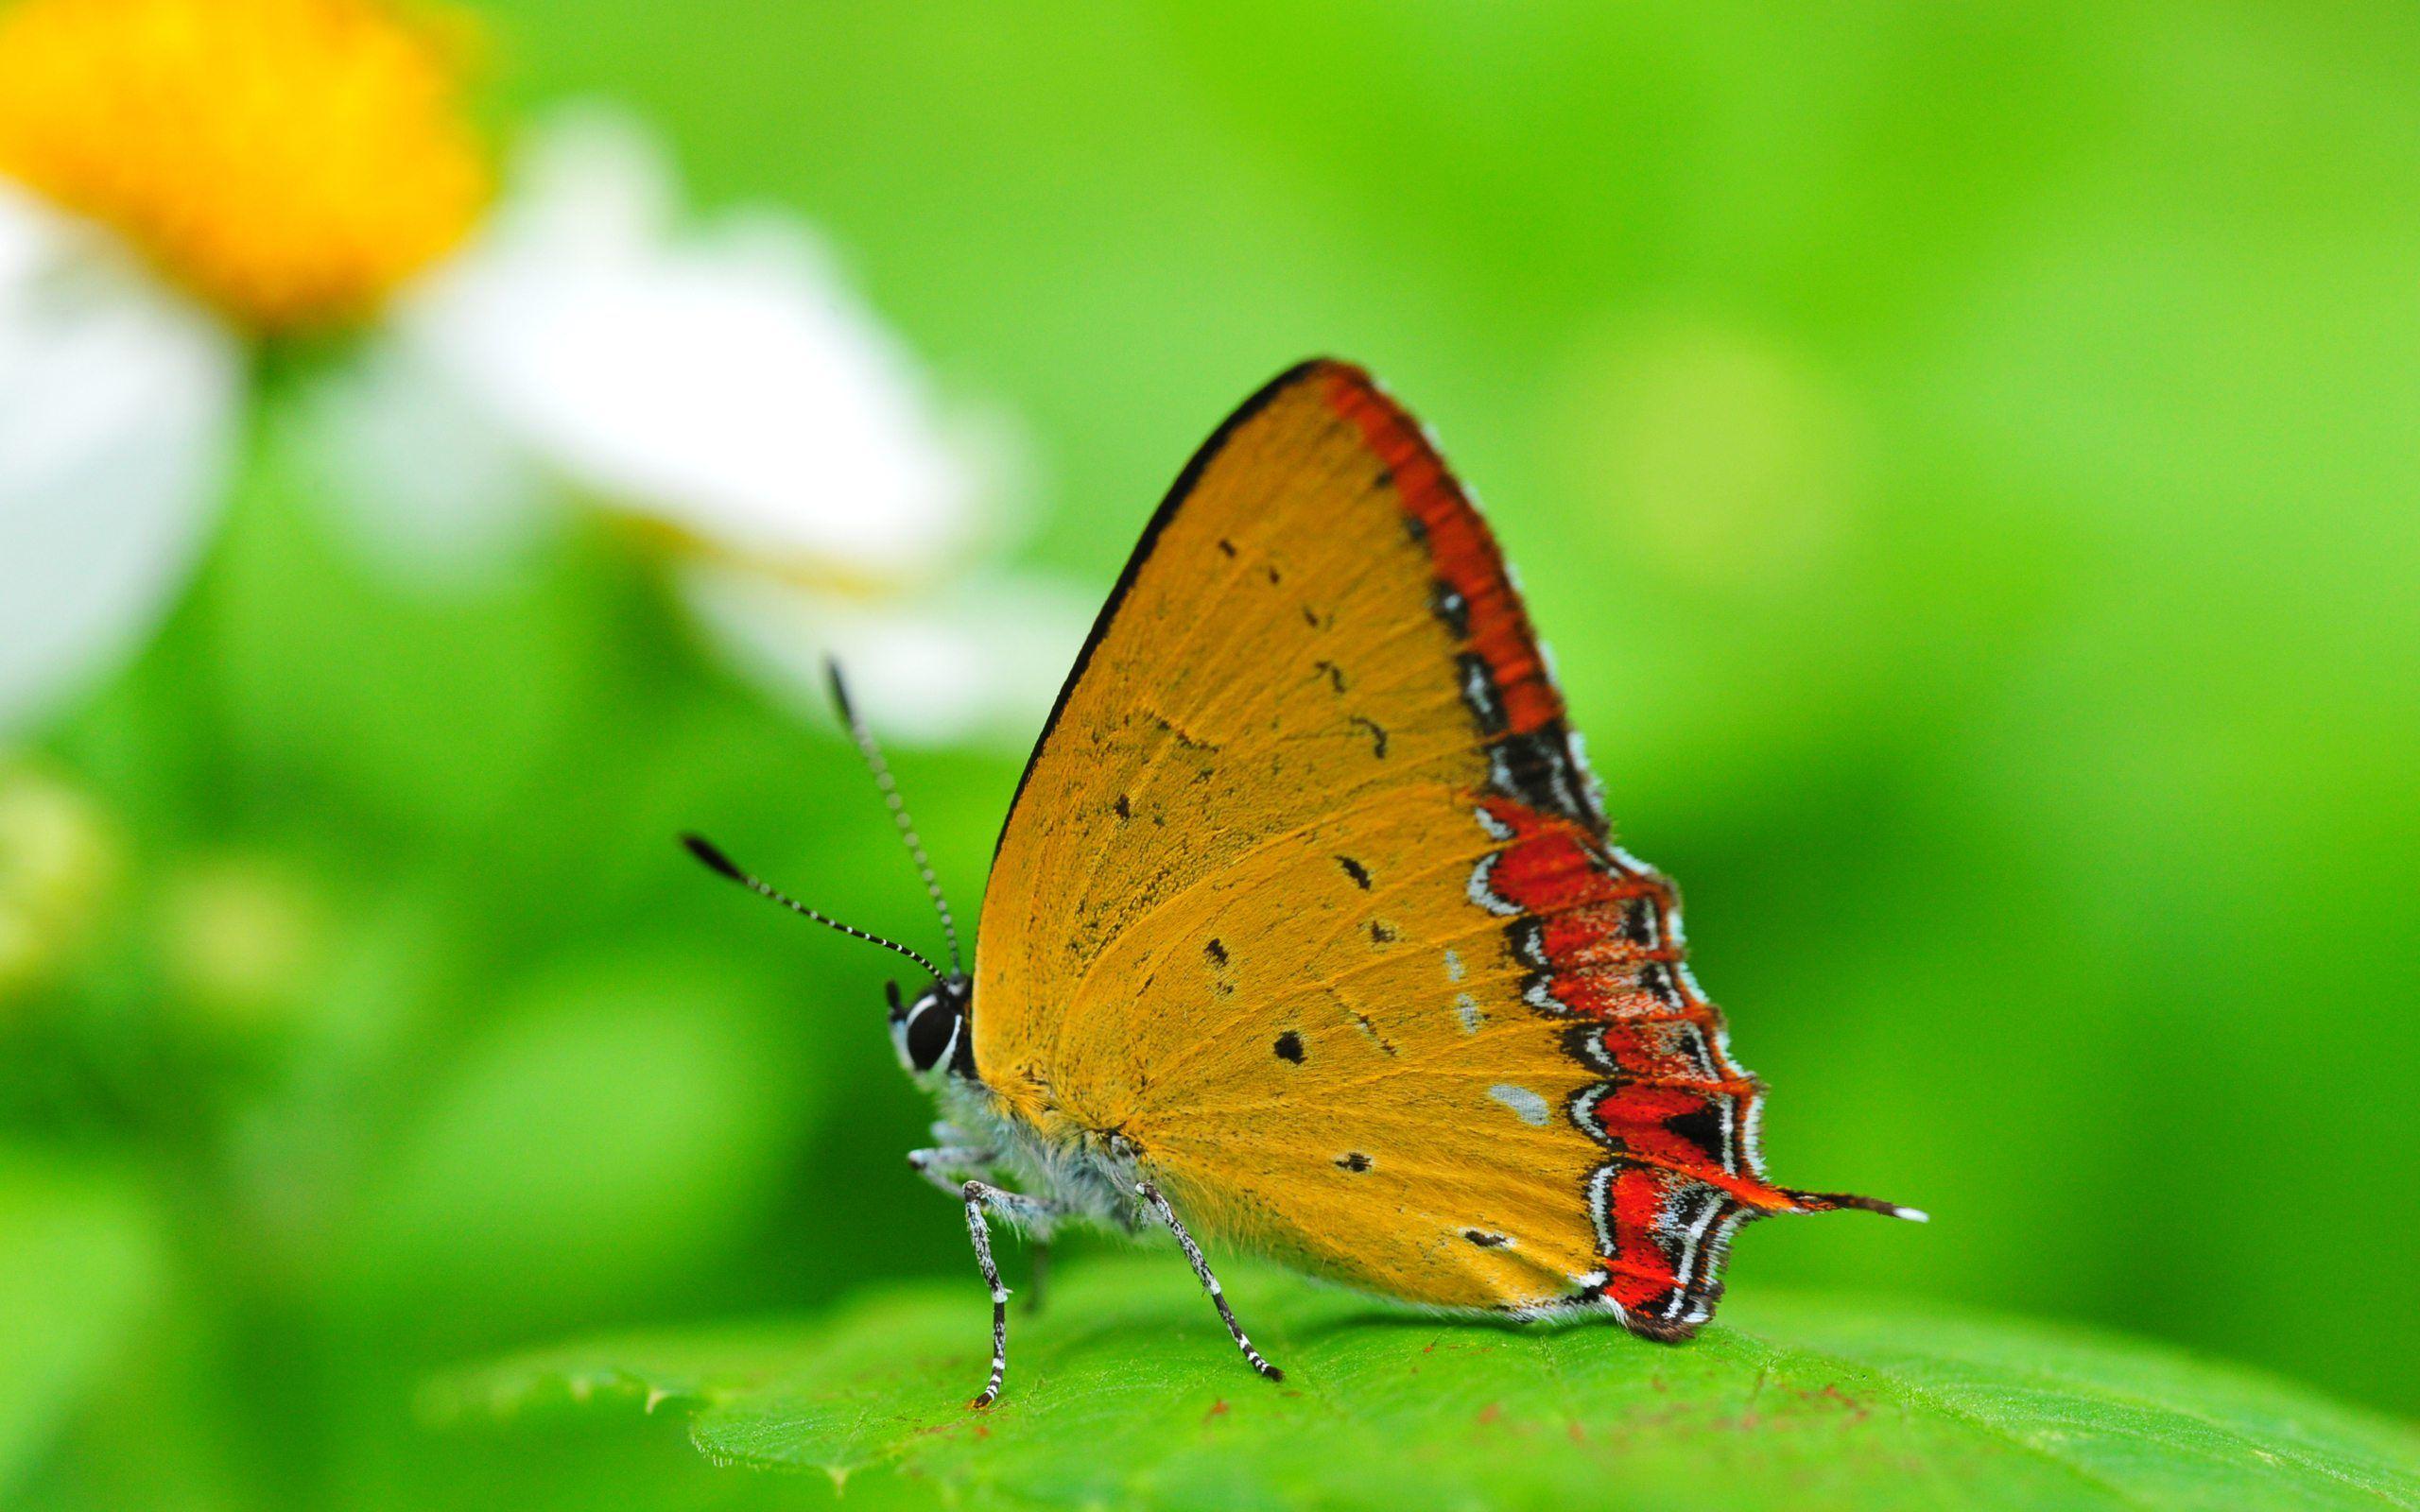 Find over 100+ of the best free natural images. Best HD Nature Backgrounds   PixelsTalk.Net